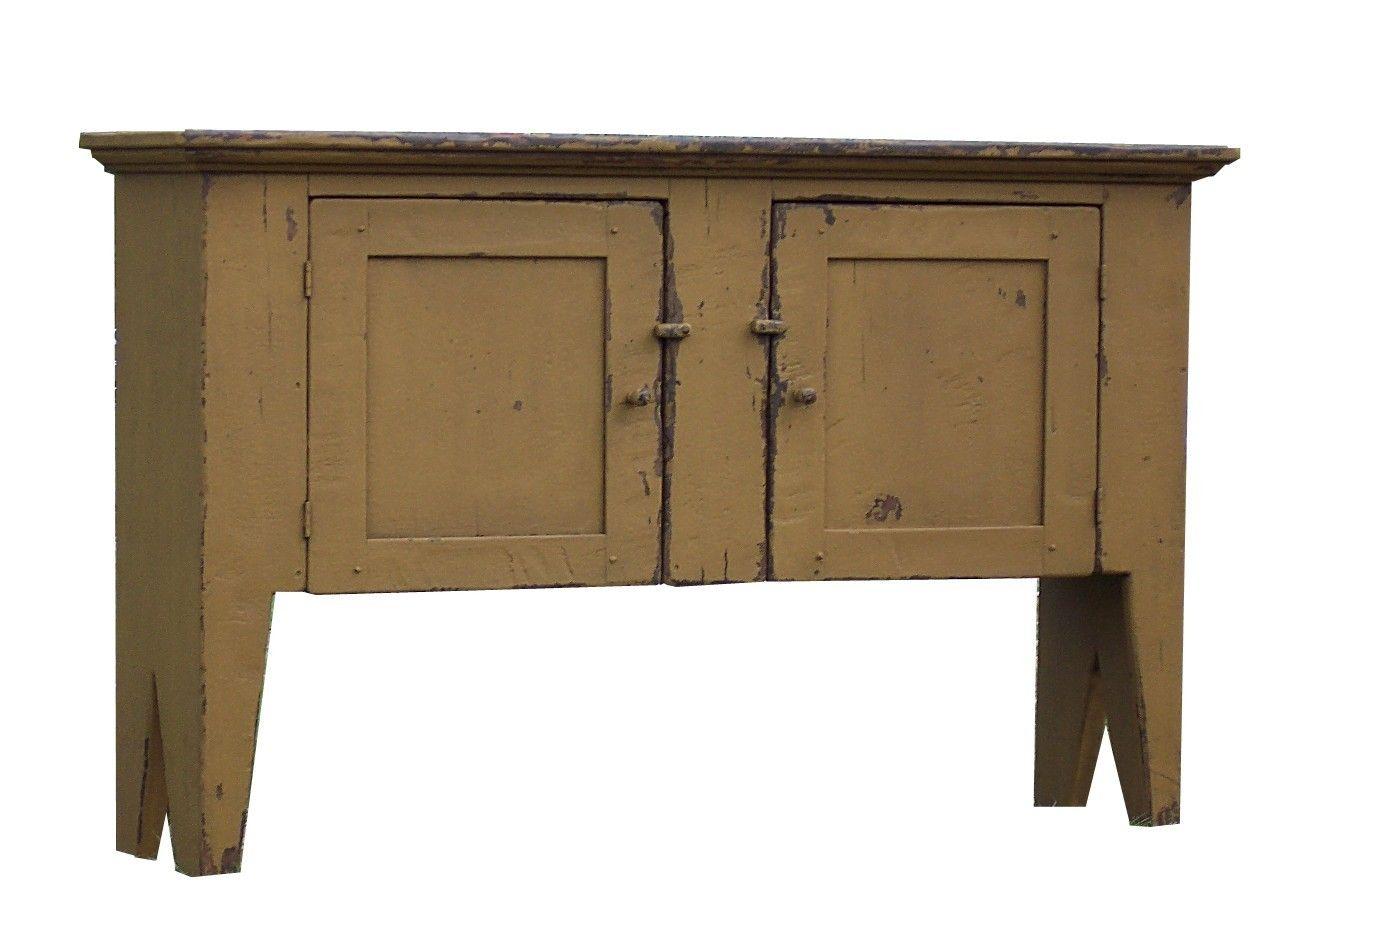 Elegant Primitive Furniture | Primitive Country Huntboard Sideboard Sofa Hall Table  Farmhouse .